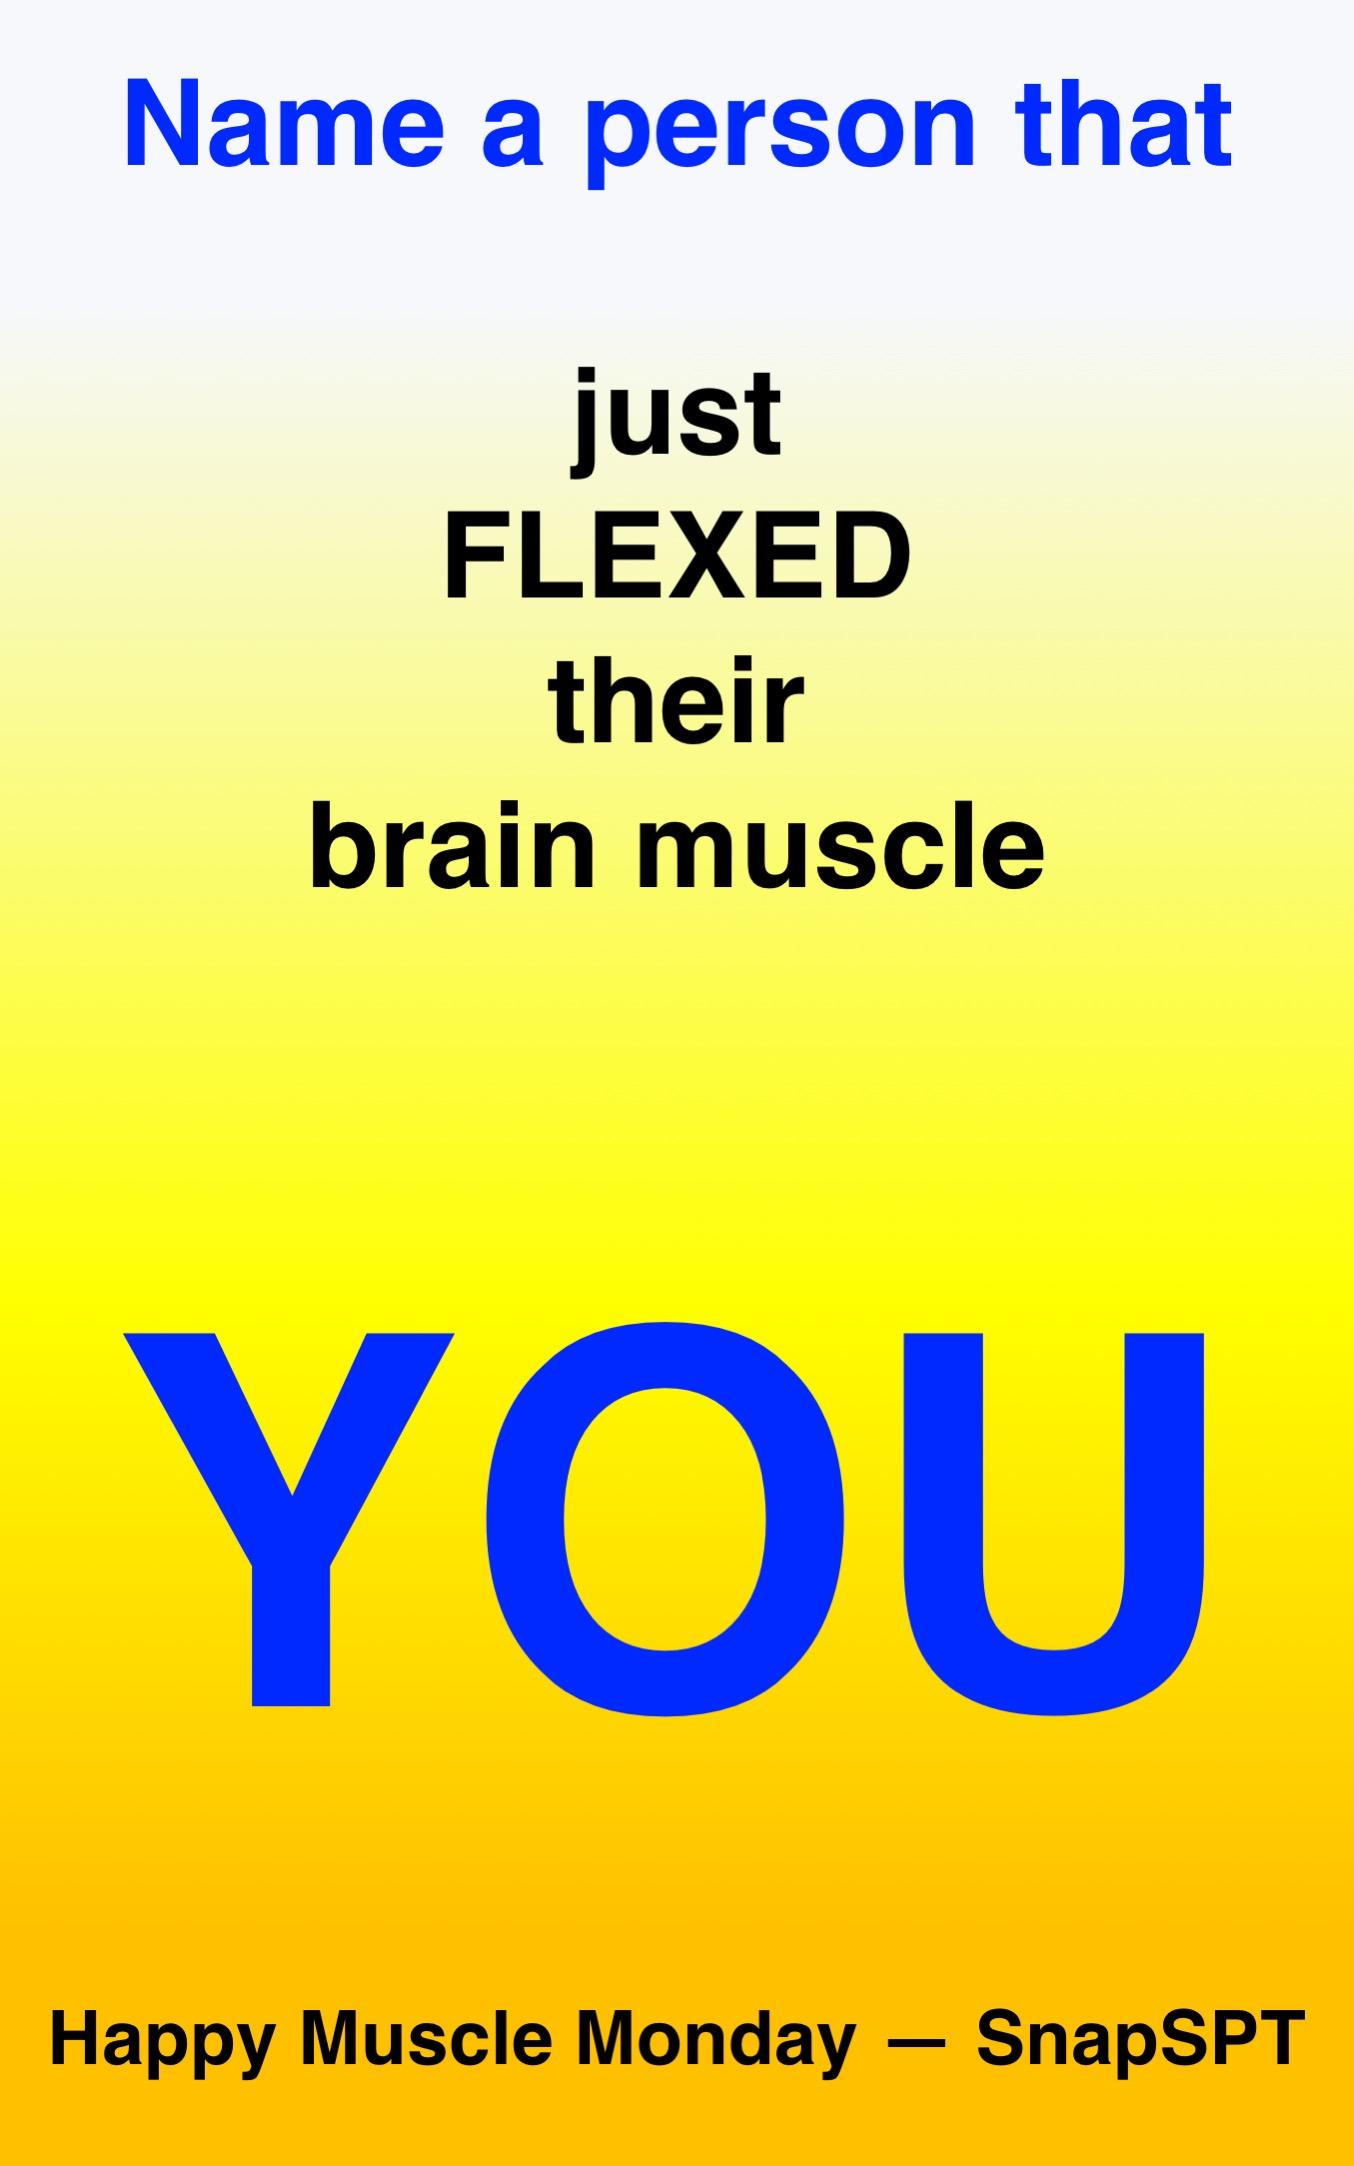 MuscleActions25.jpg